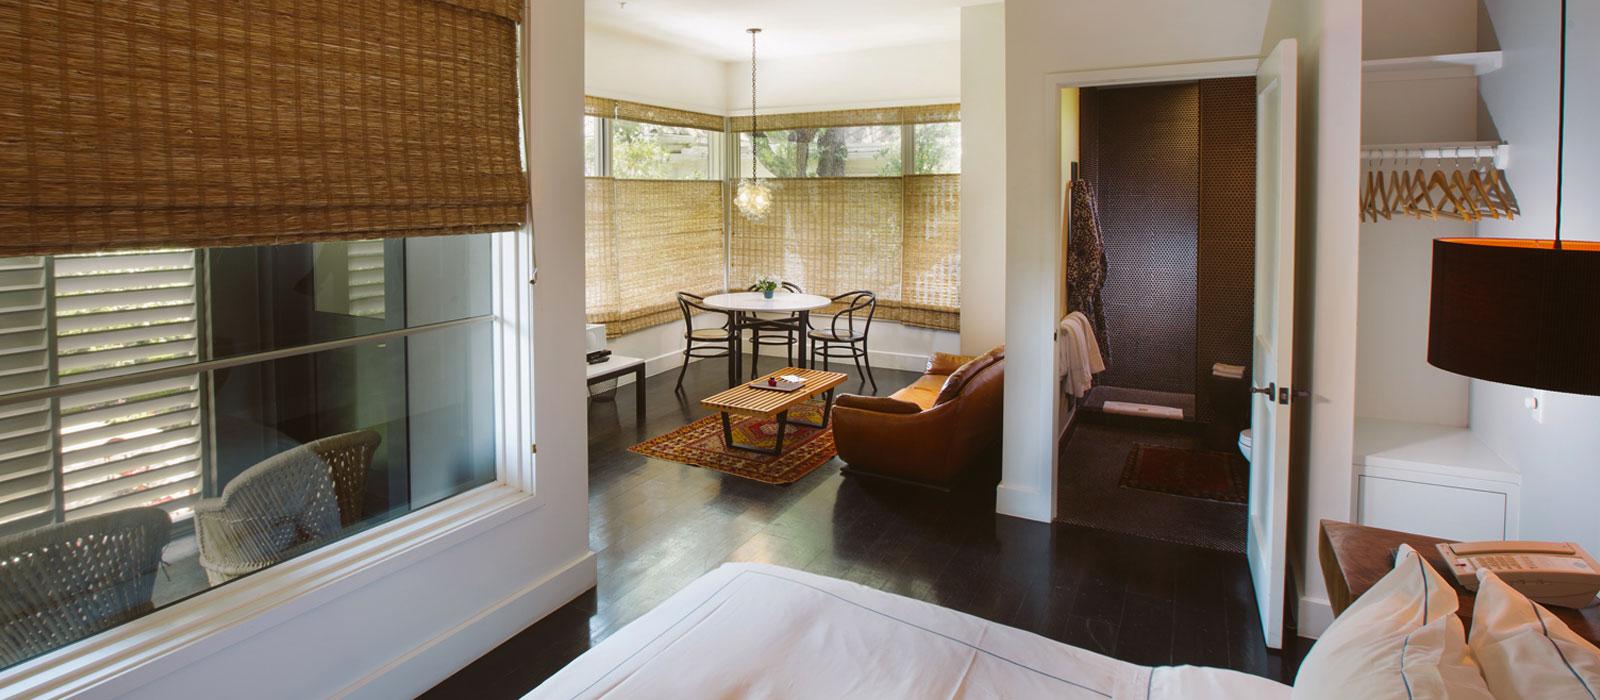 11 studio Hotel Saint Cecilia Austin Texas interior design vintage apartment ciekawe wnetrza hotelowe styl amerykanski